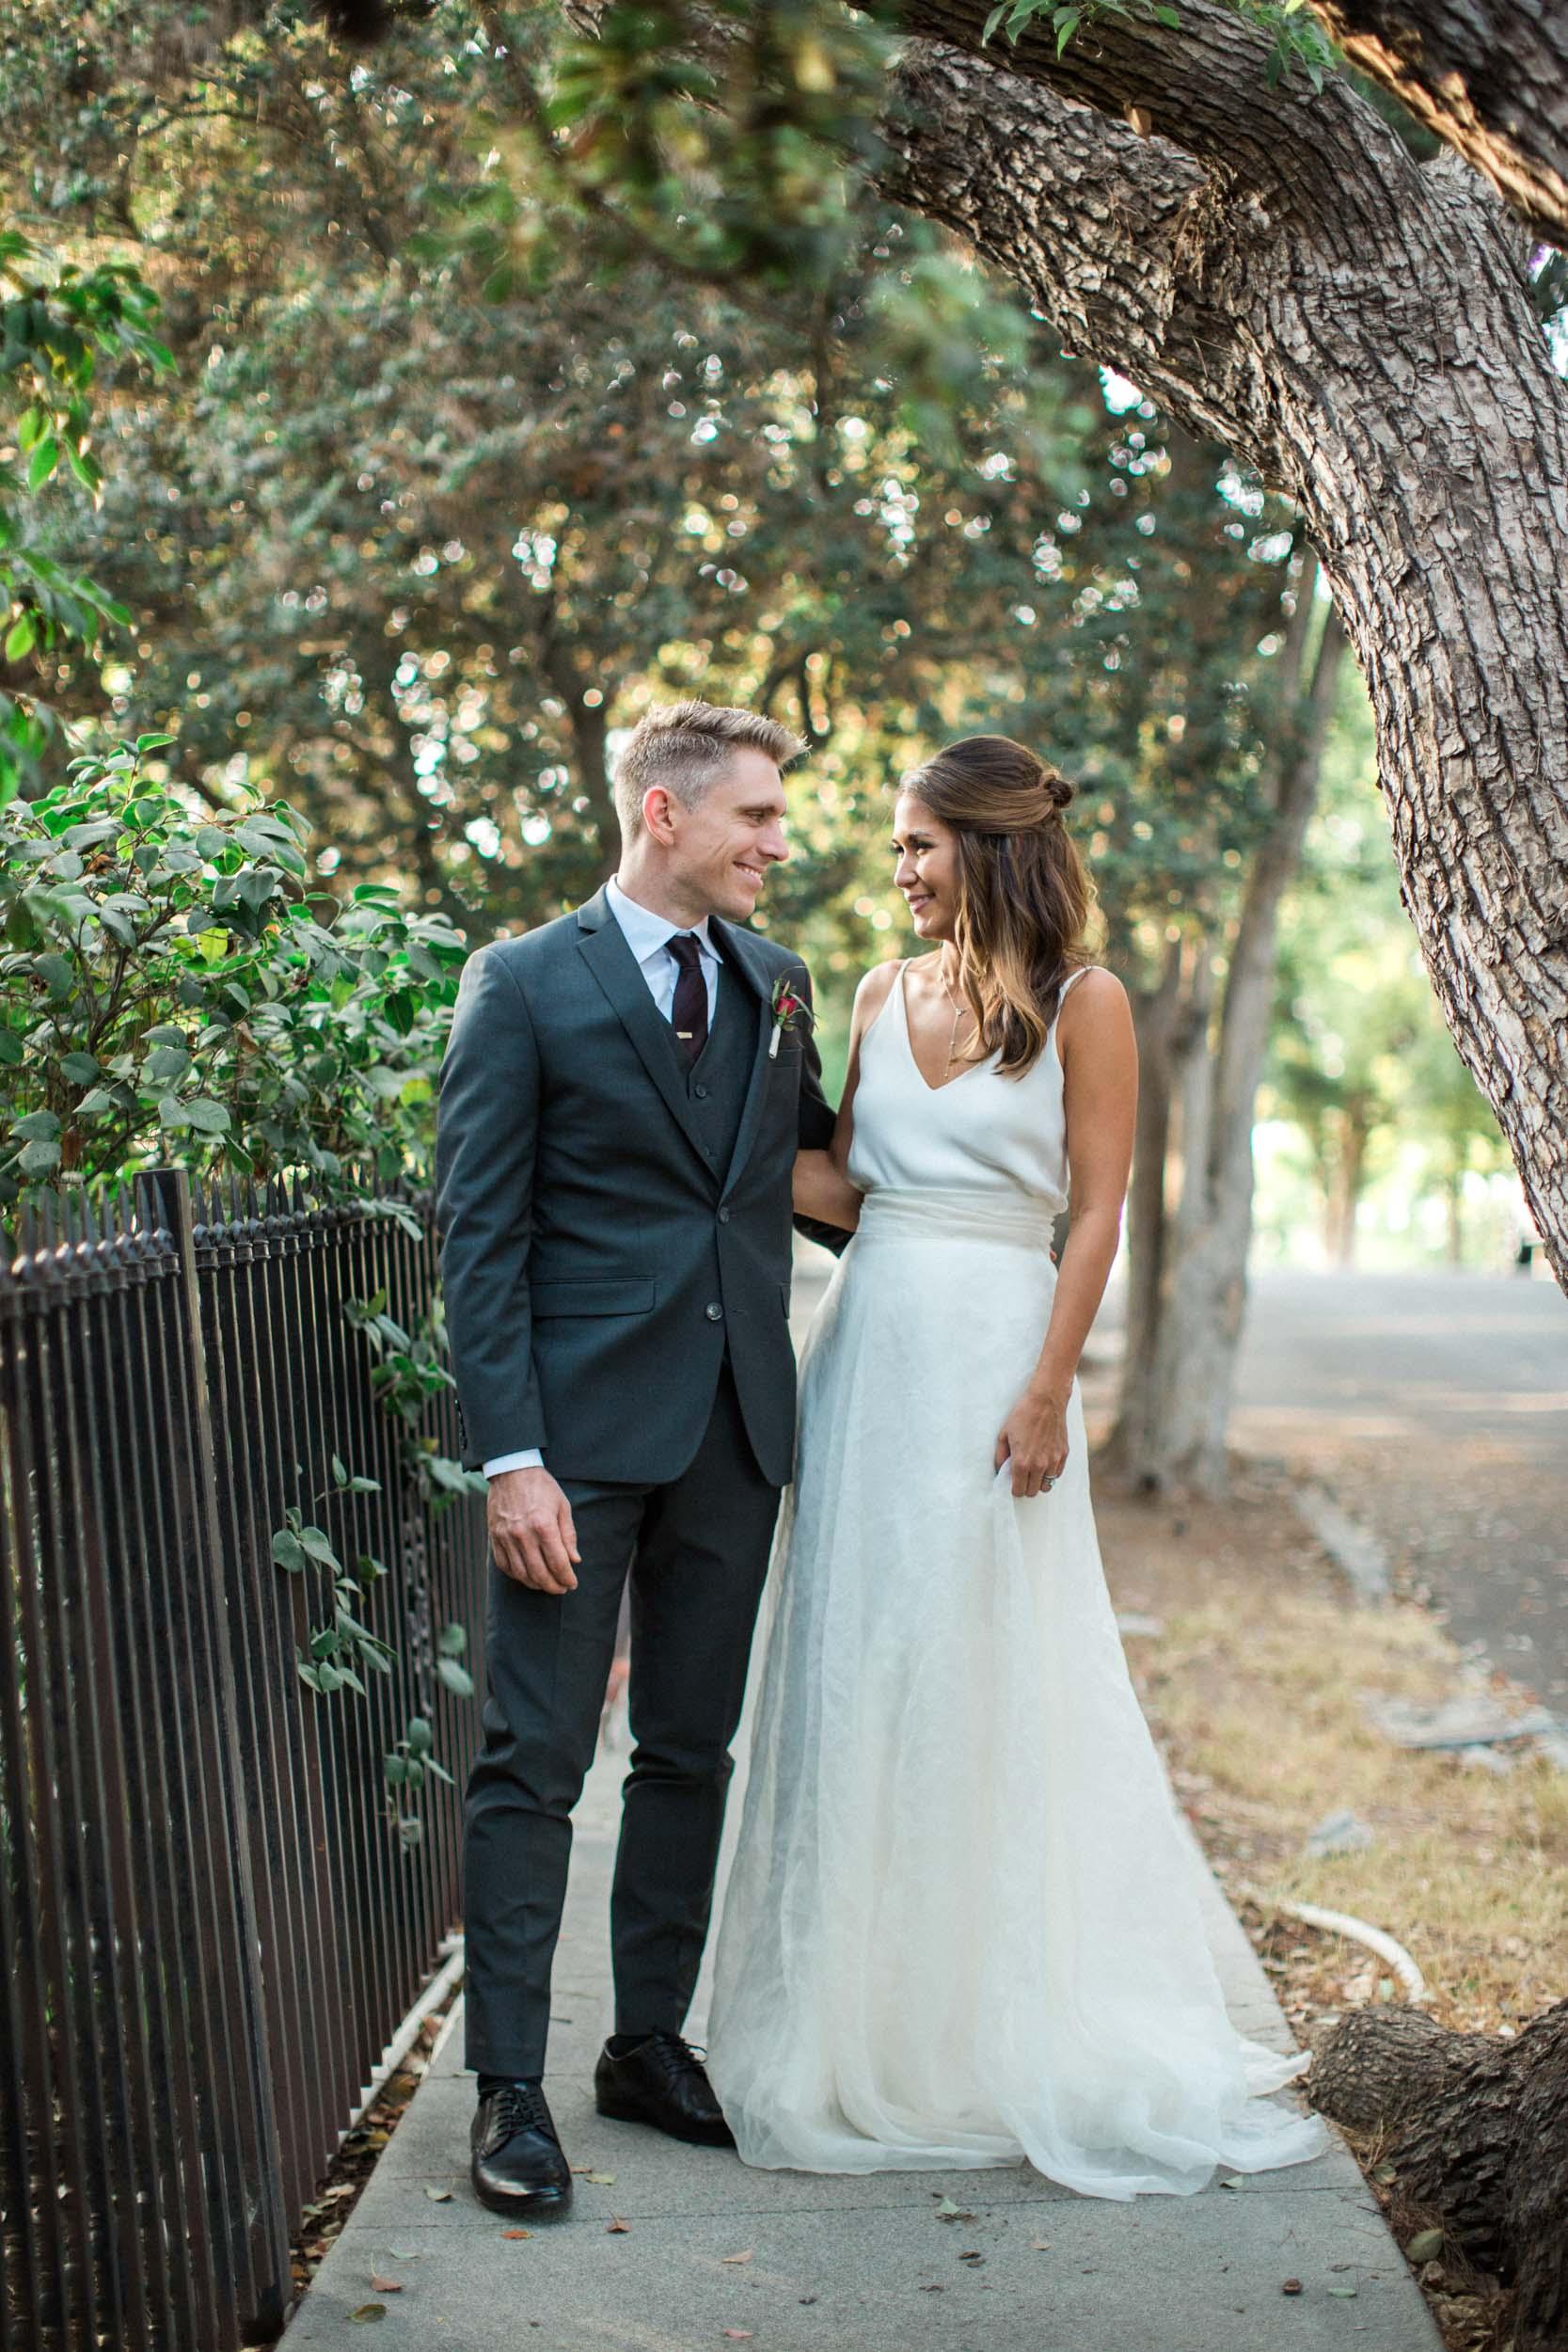 BKM-Photography-Highland-Park-Los-Angeles-Backyard-Wedding-0040.jpg